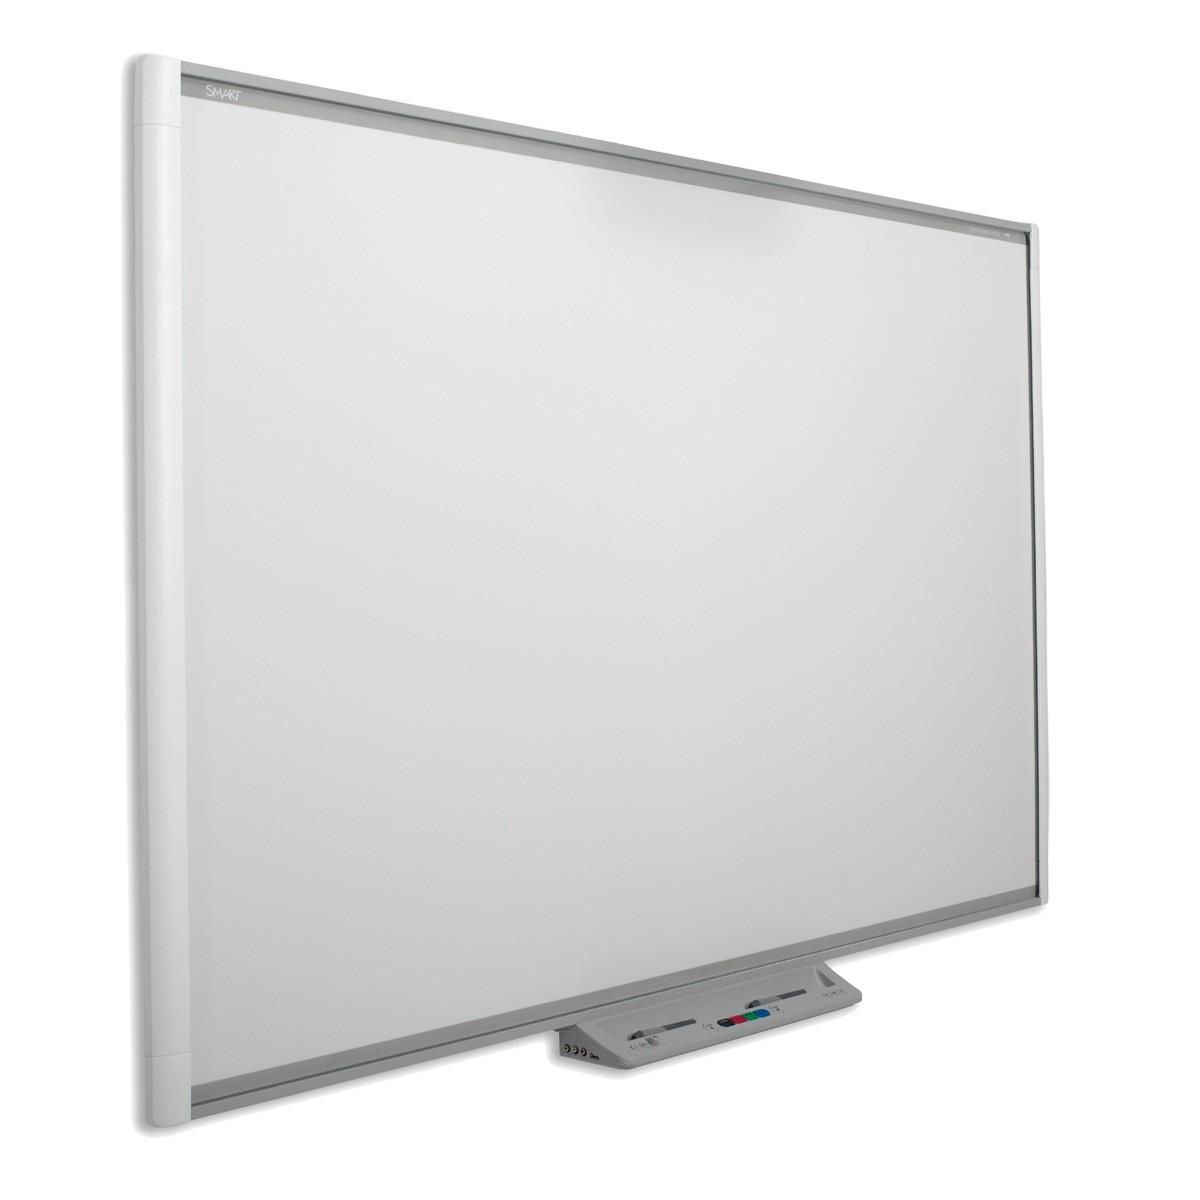 Smartek Smart Board M680 77 Diagonally 61.6x46.3 Interactive Whiteboard SBM680